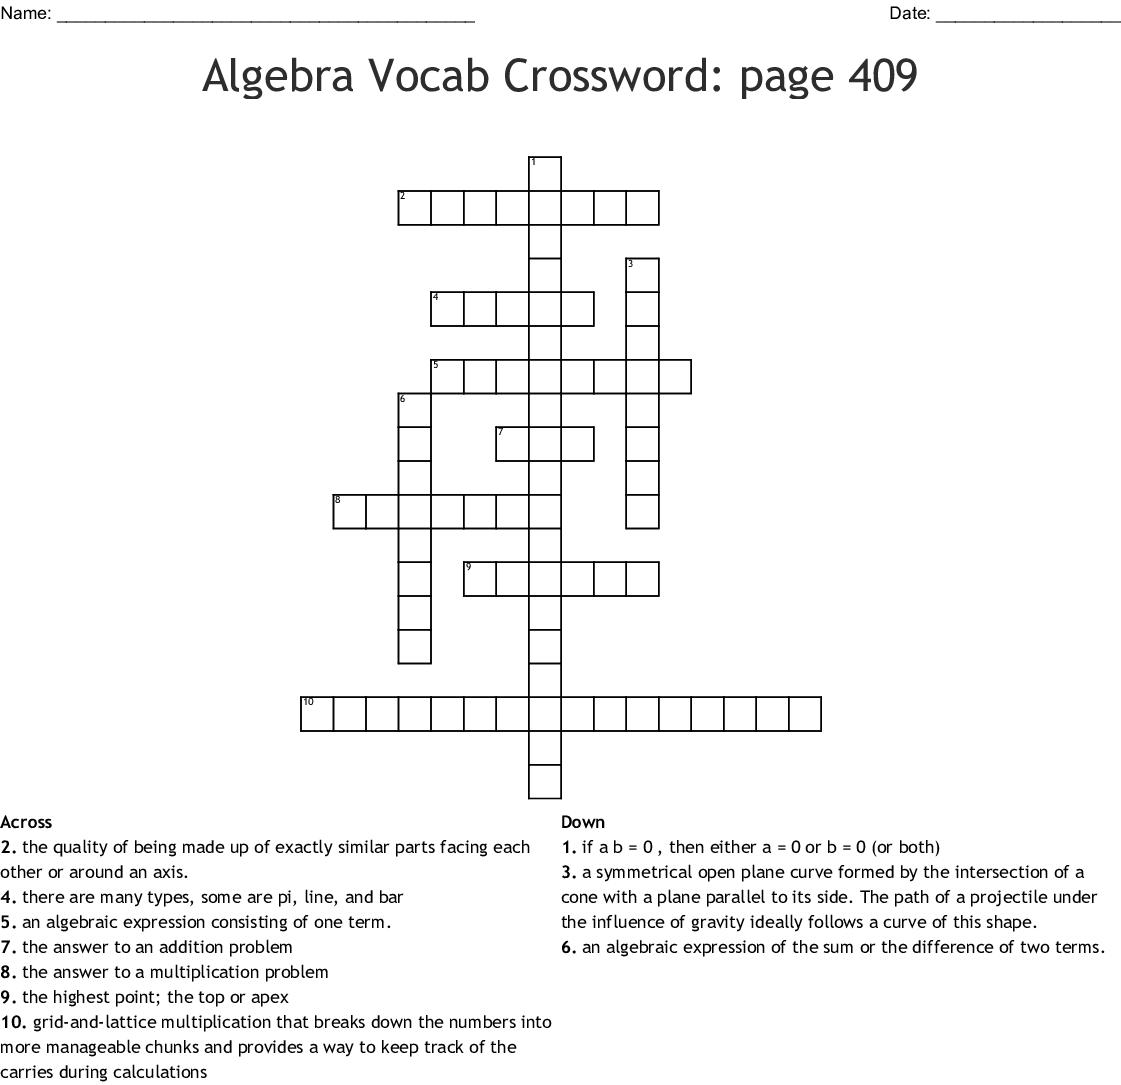 Algebra Vocab Crossword Page 409 Crossword